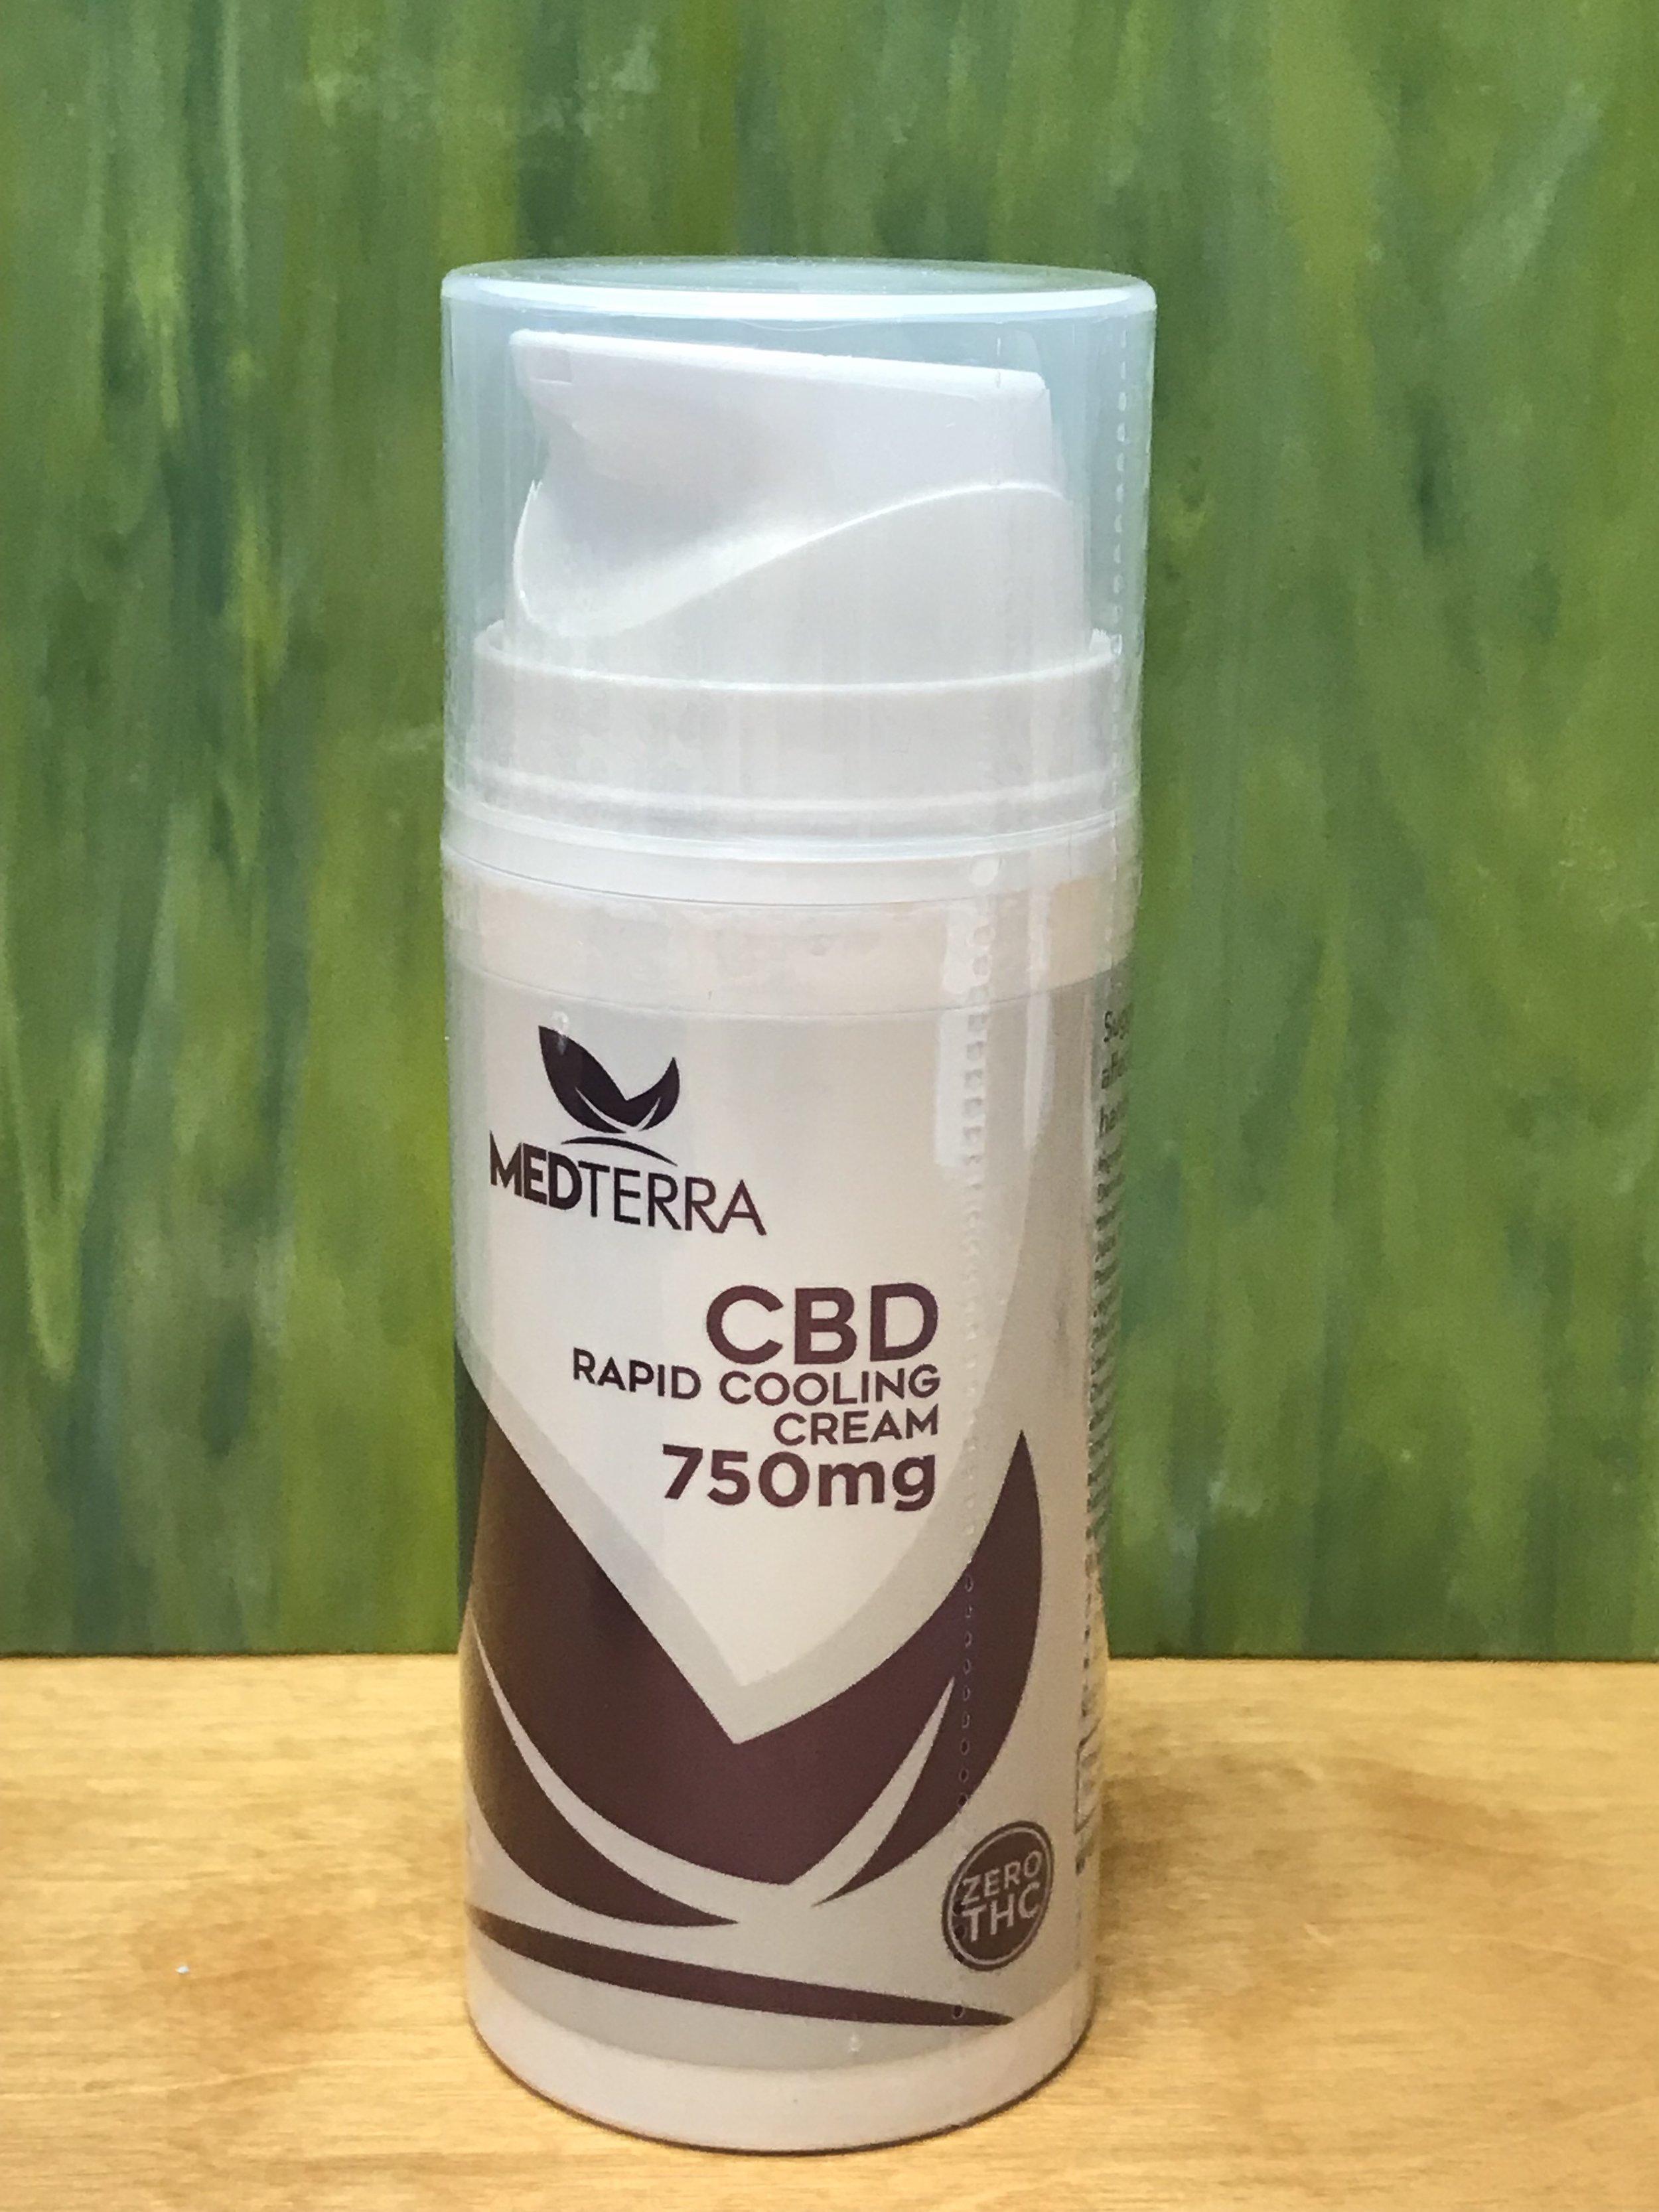 Medterra Cooling Cream 750mg (thc free) - $100.00